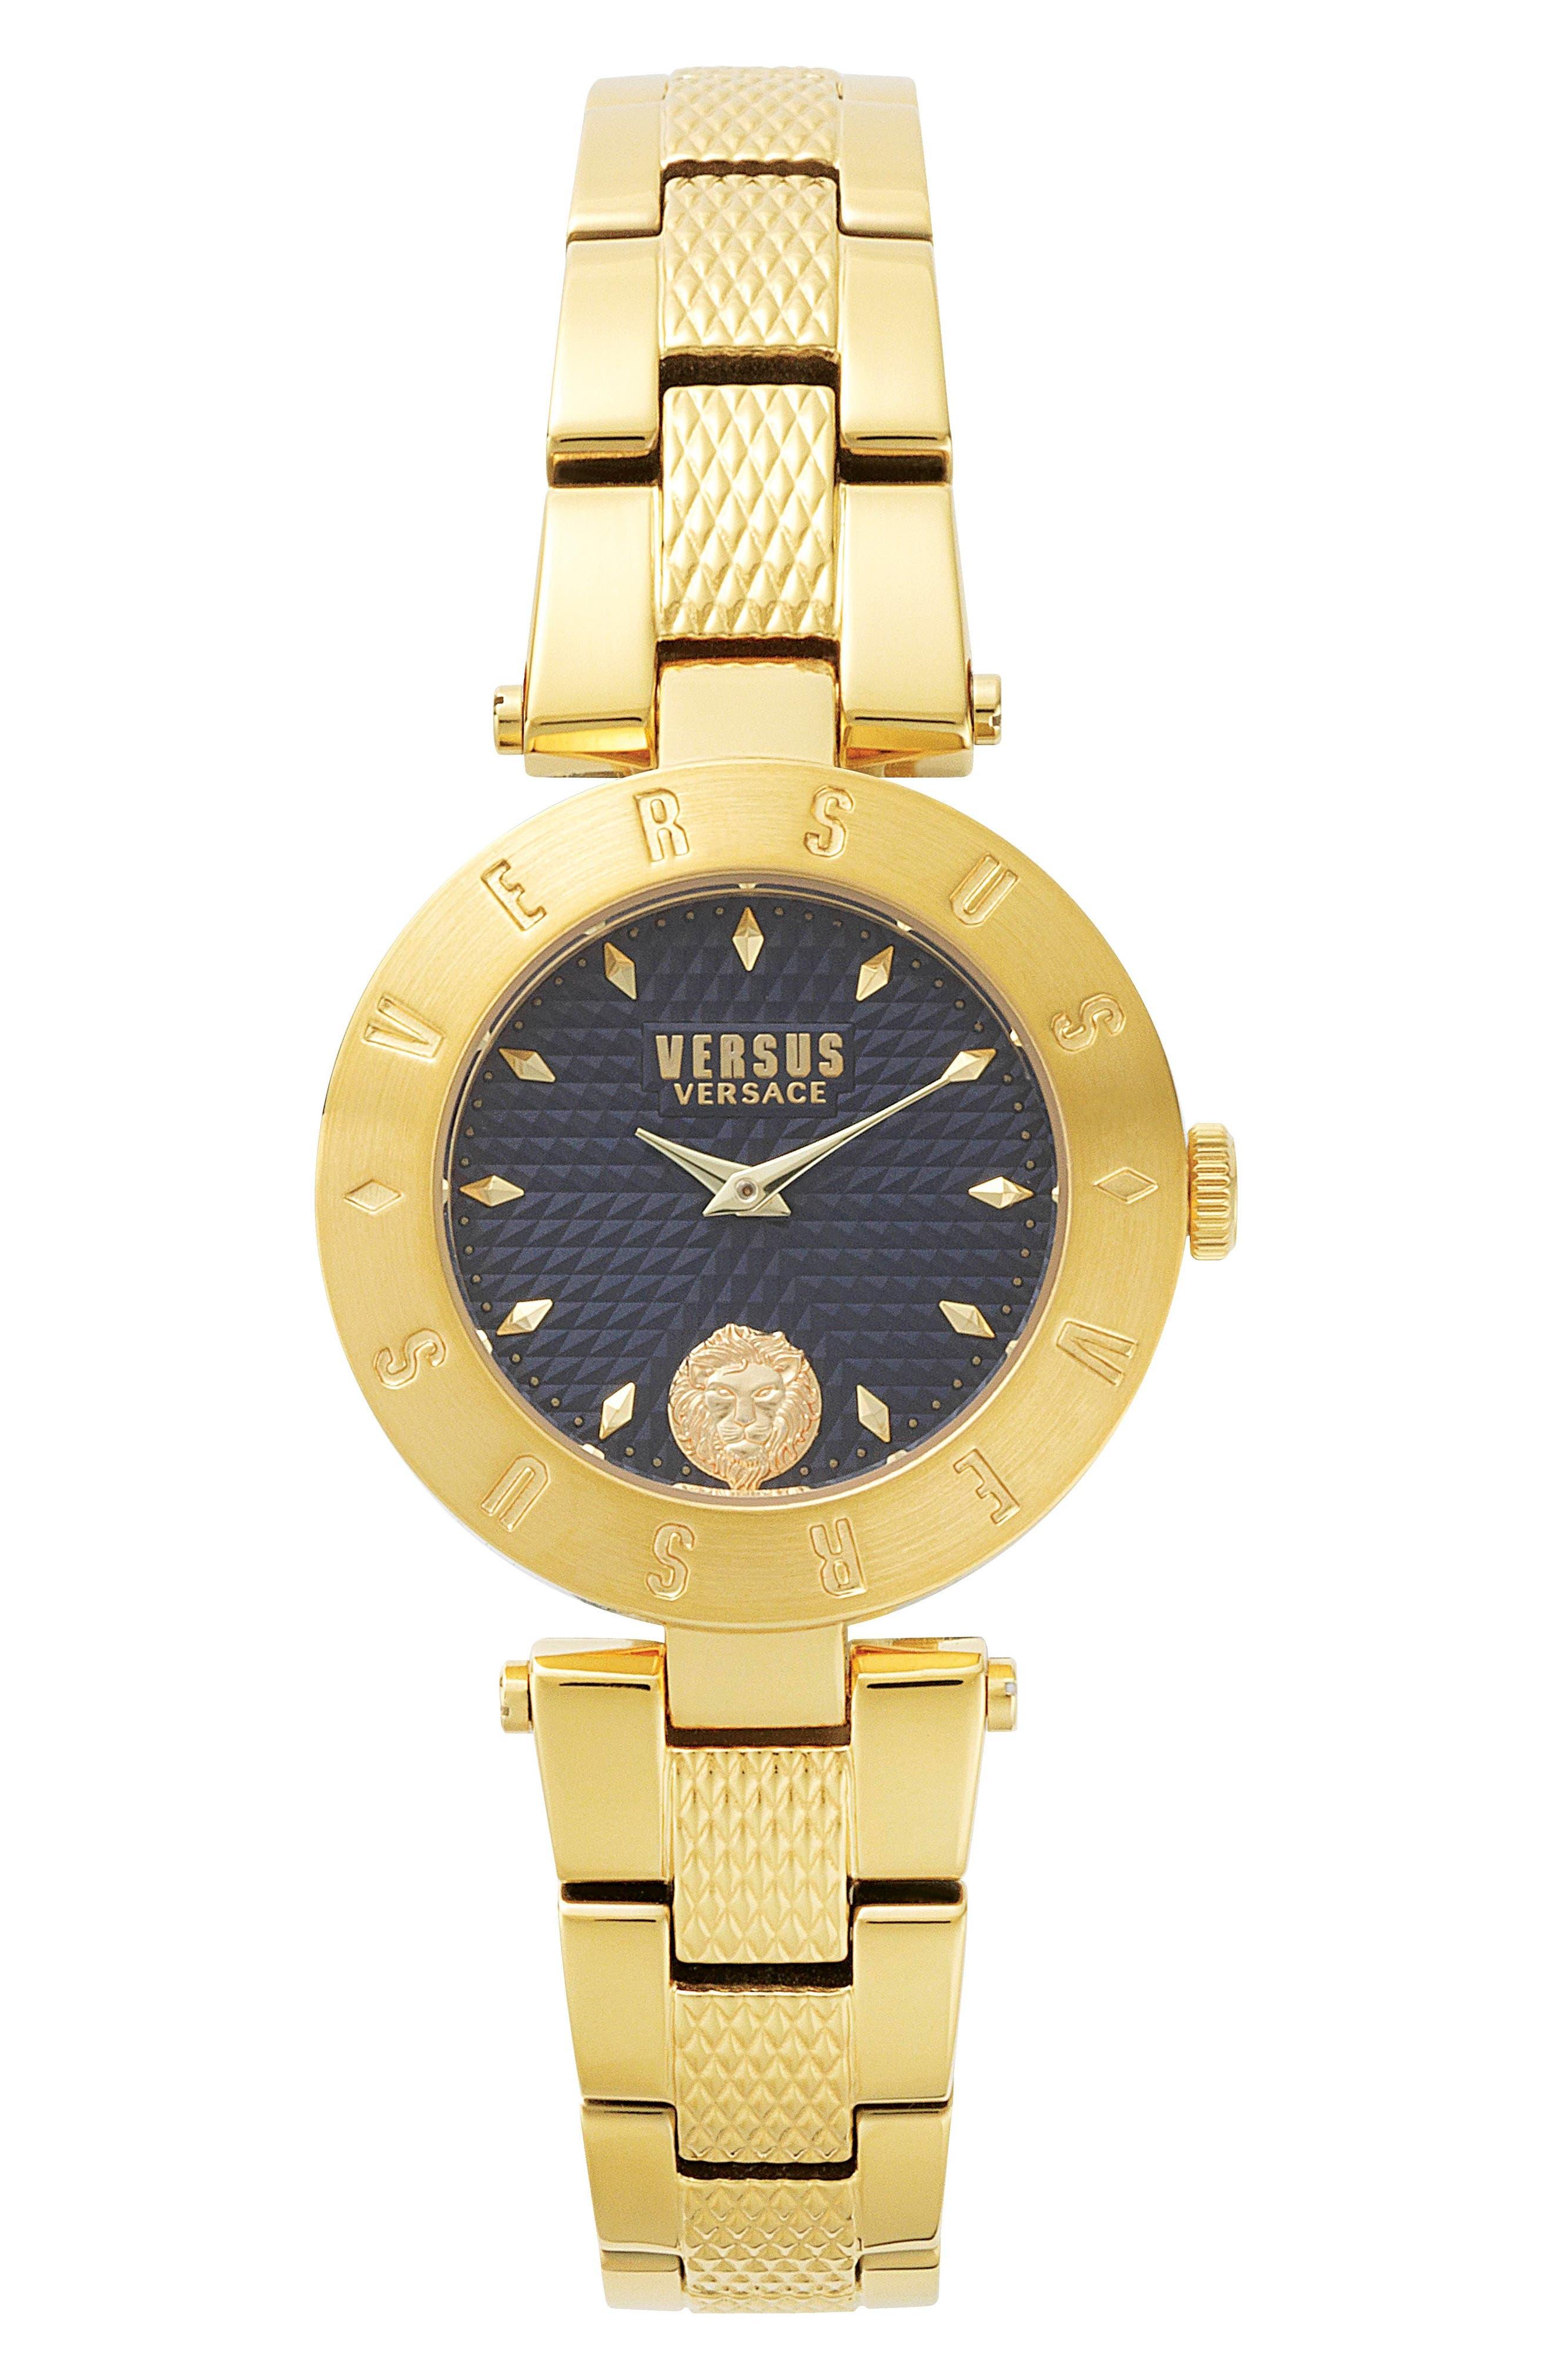 Main Image - Versus by Versace New Logo Bracelet Watch, 34mm